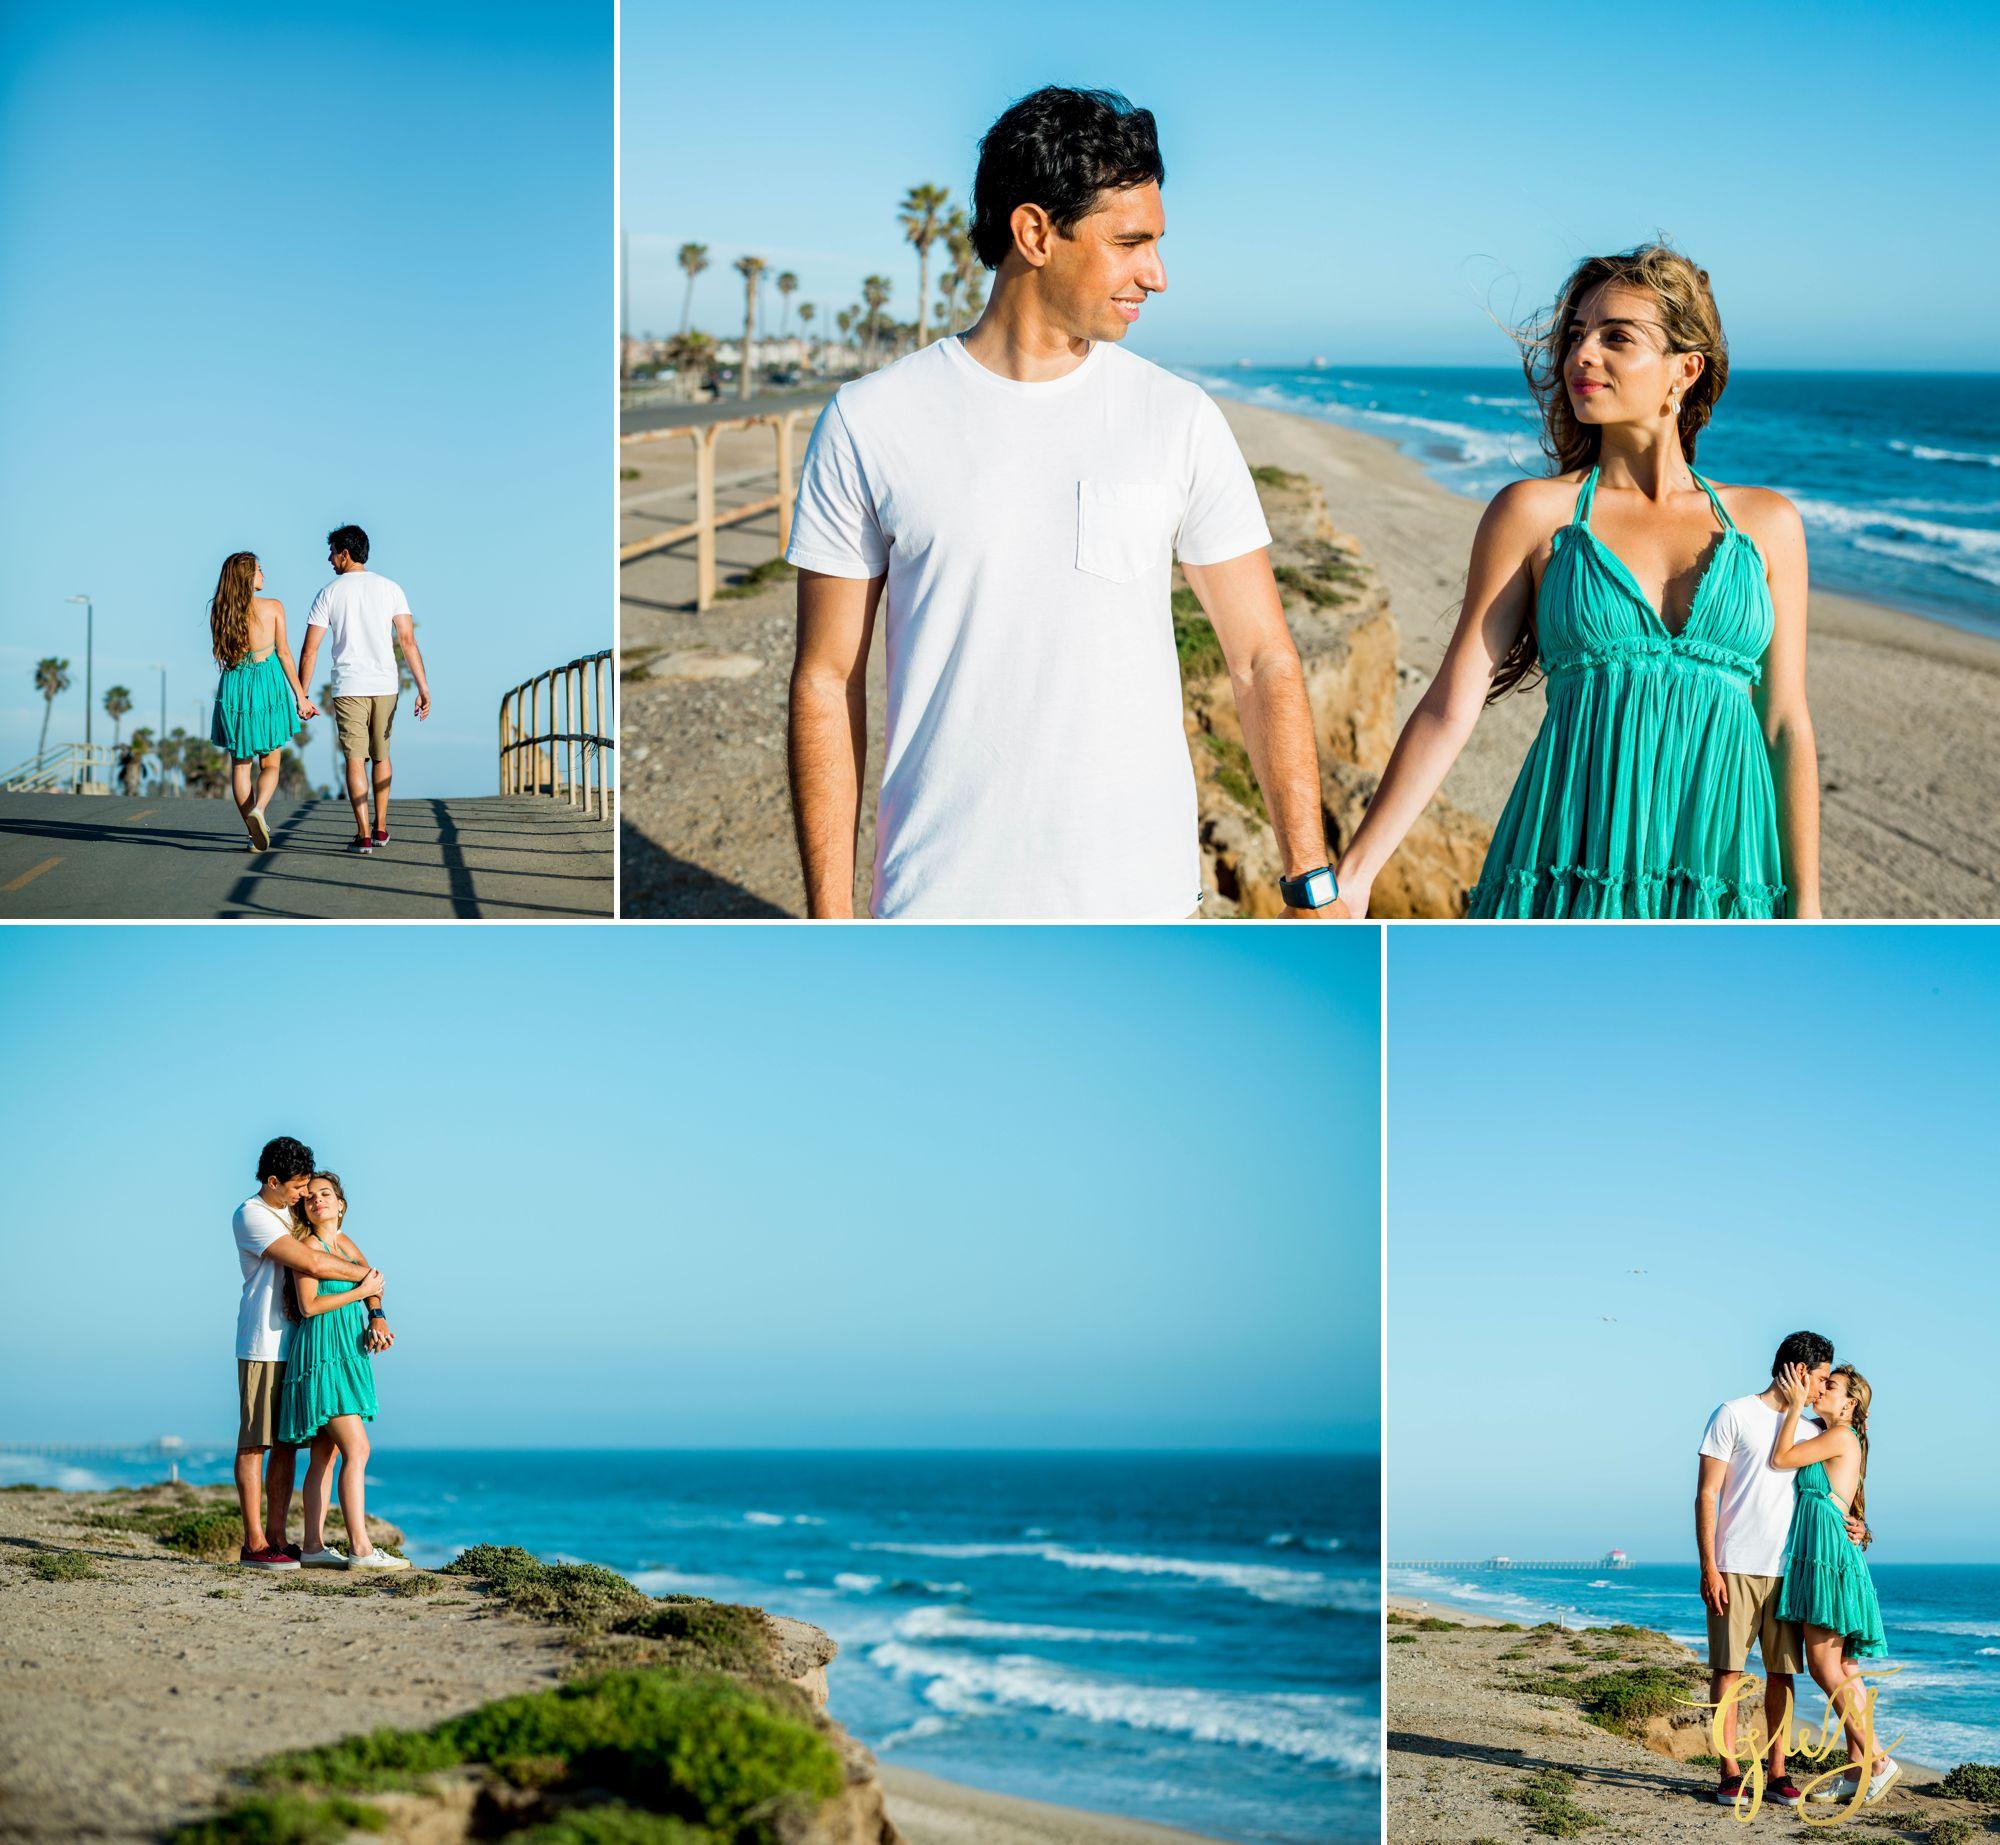 Felipe + Isabella Huntington Beach Summer Sunset Engagement Session by Glass Woods Media 9.jpg